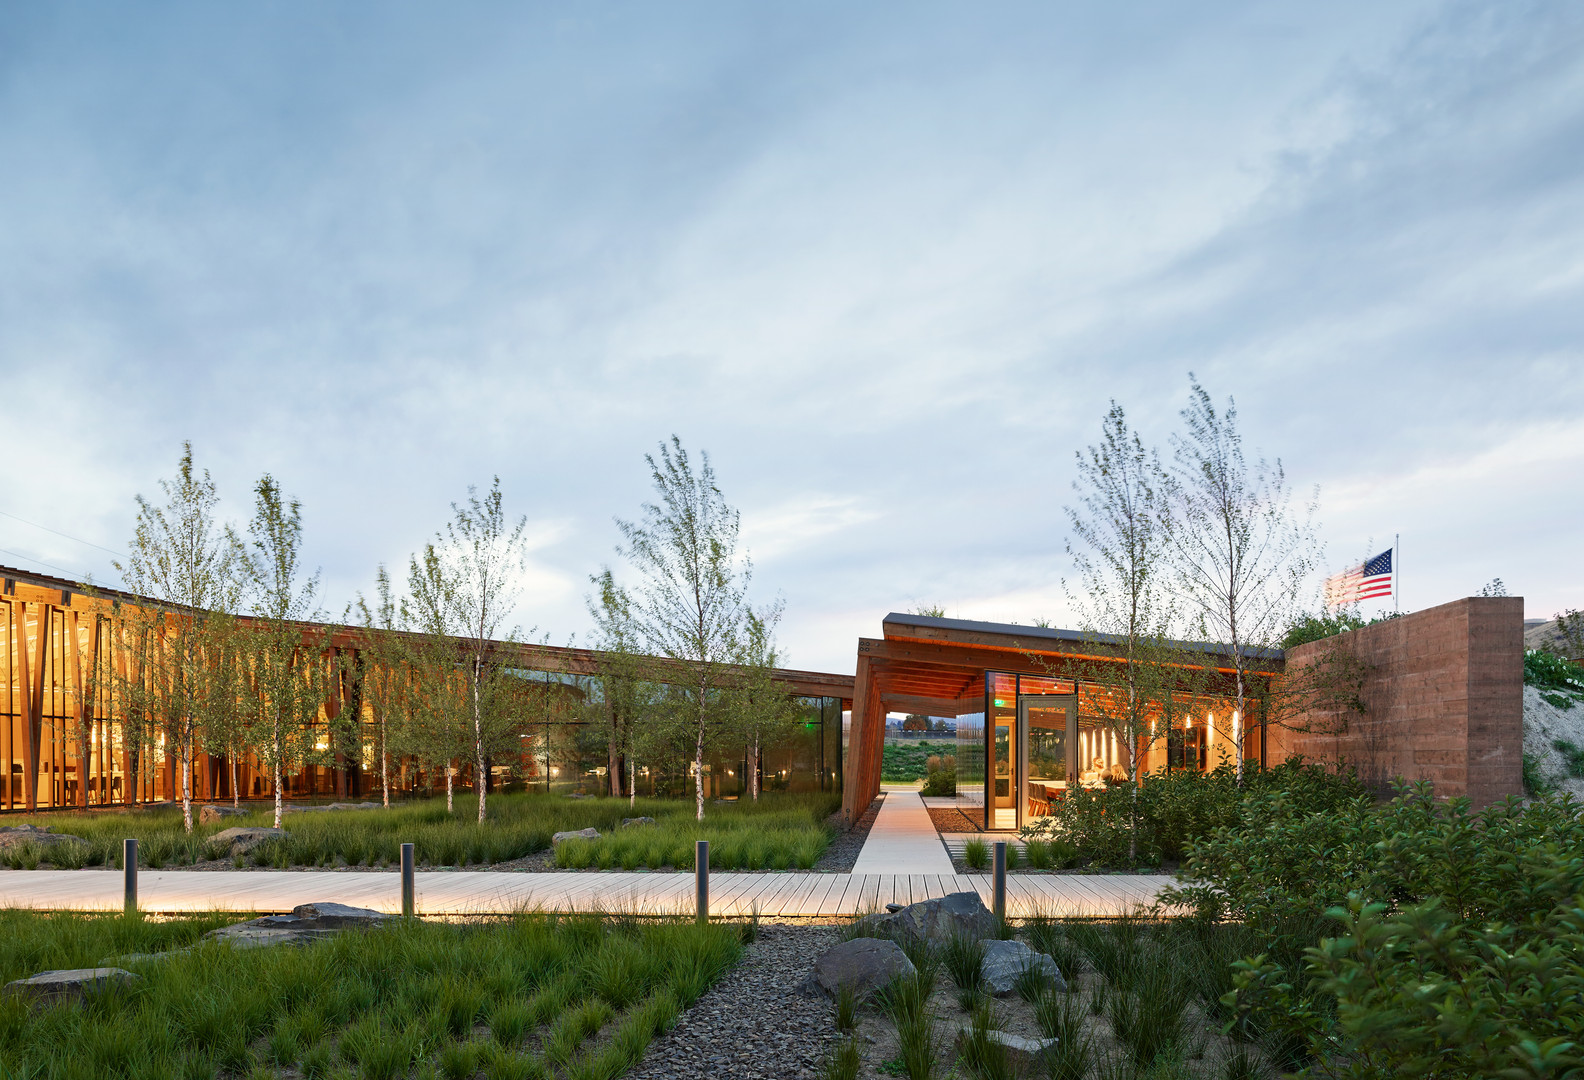 ARCHITECTURE, Commercial: Washington Fruit & Produce Company Headquarters